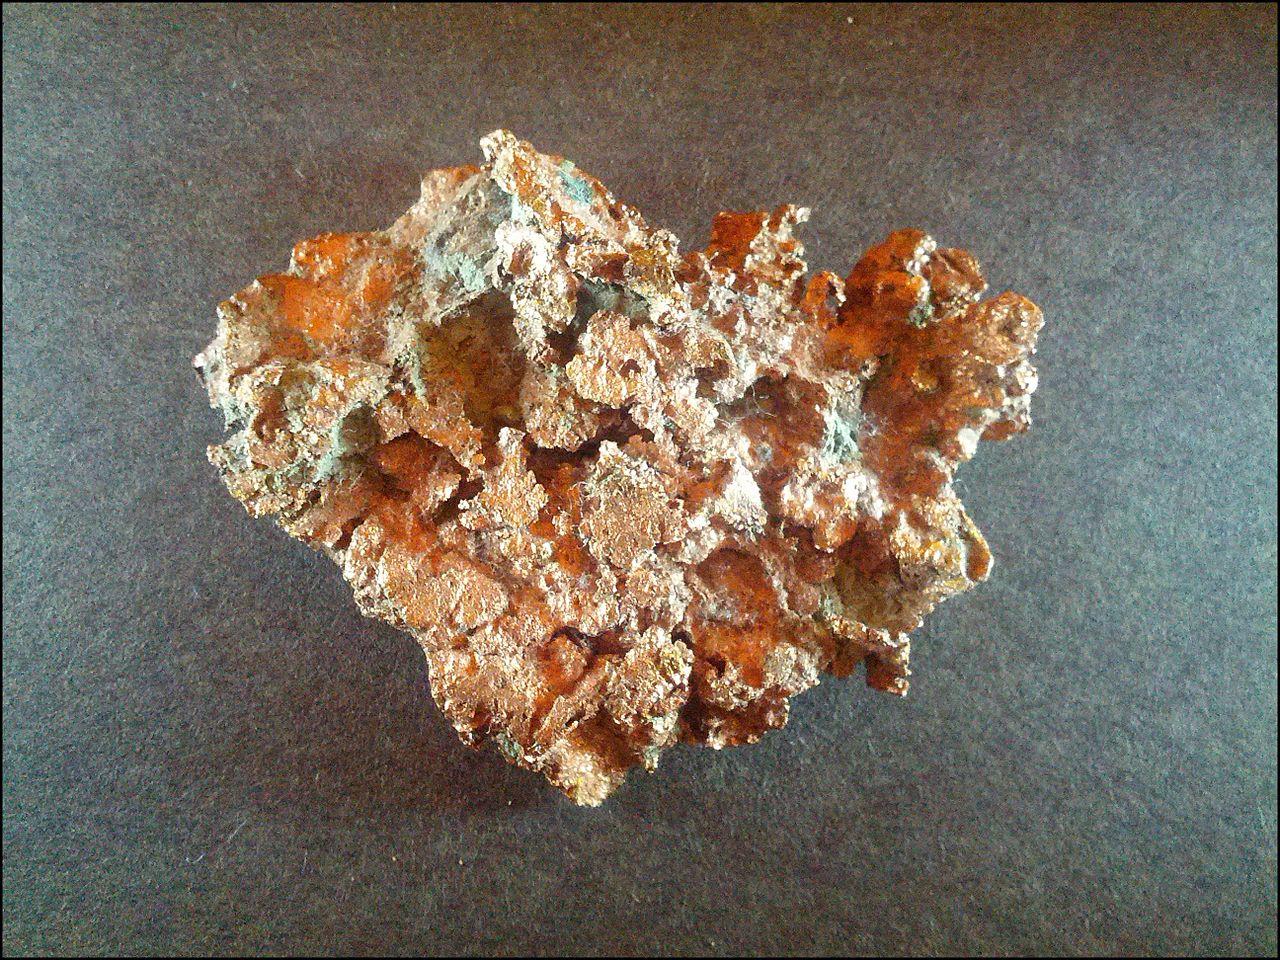 1280px-Native_Copper_from_the_Keweenaw_Peninsula_Michigan